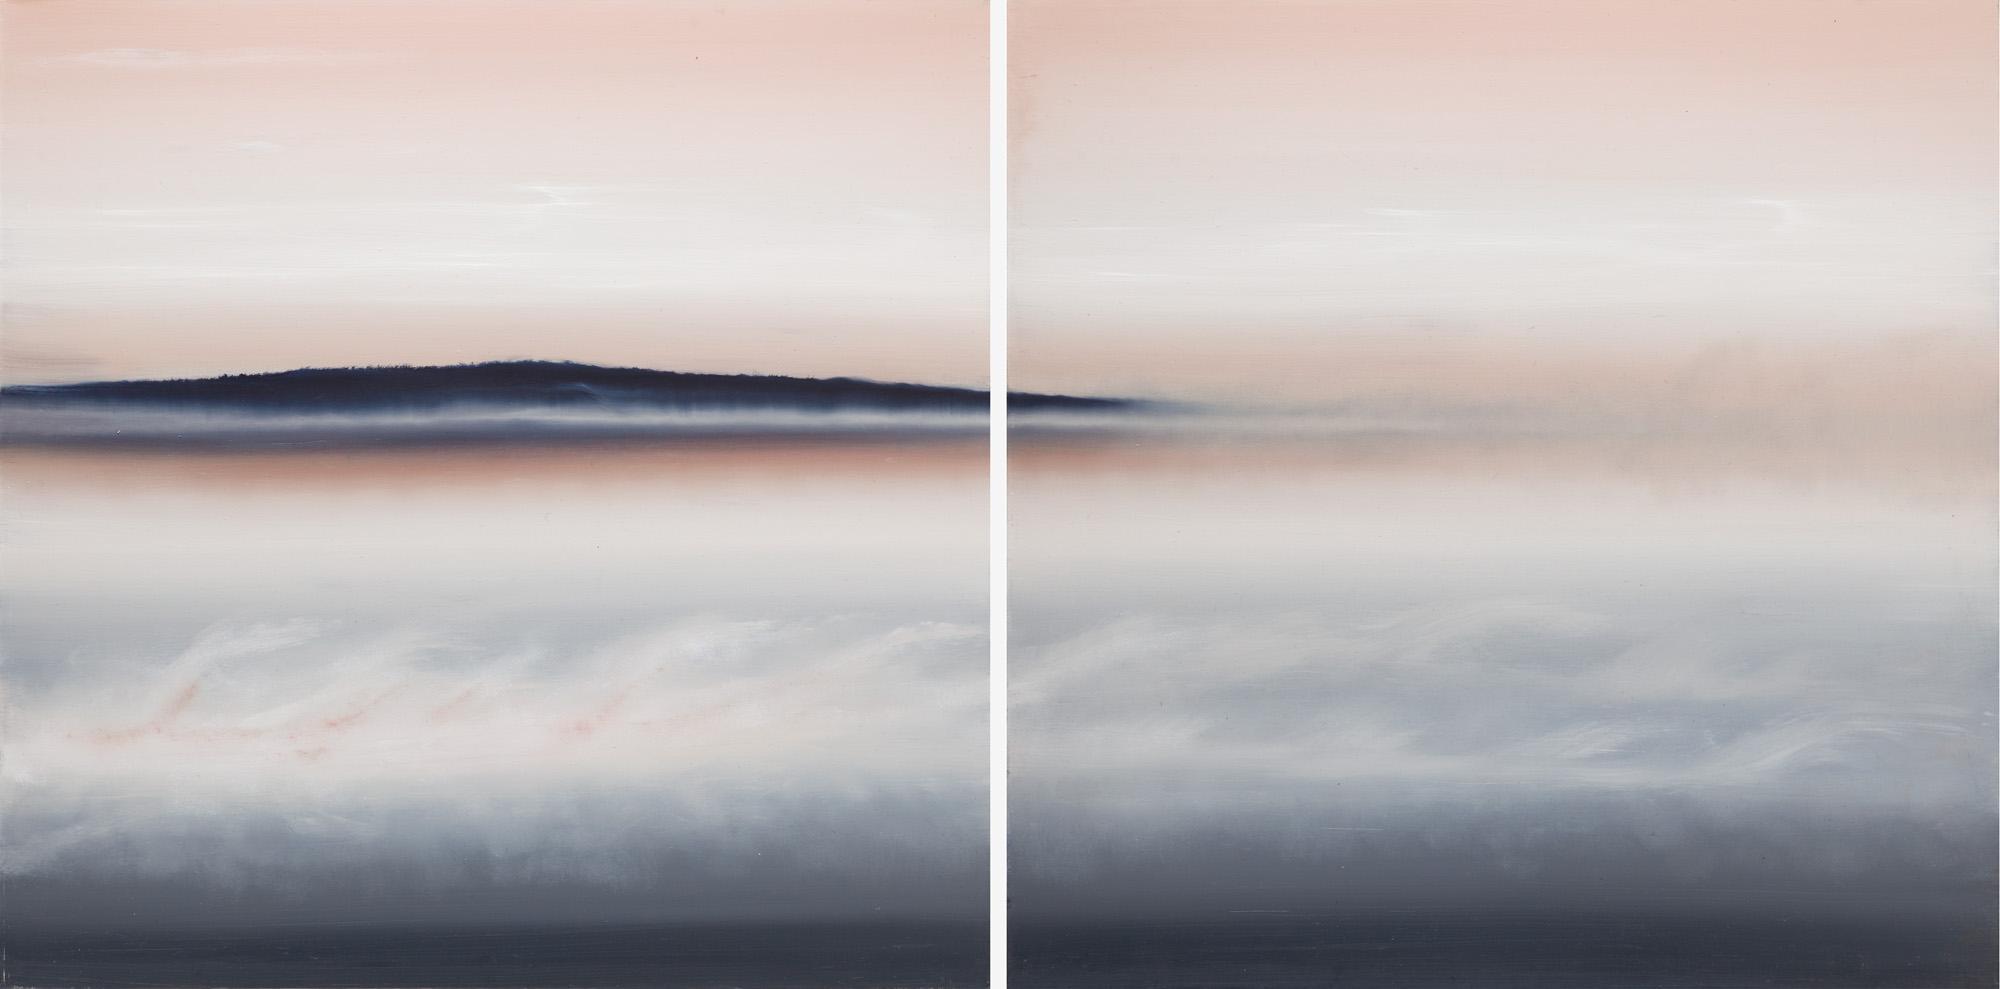 Cisza, dyptyk, 2019